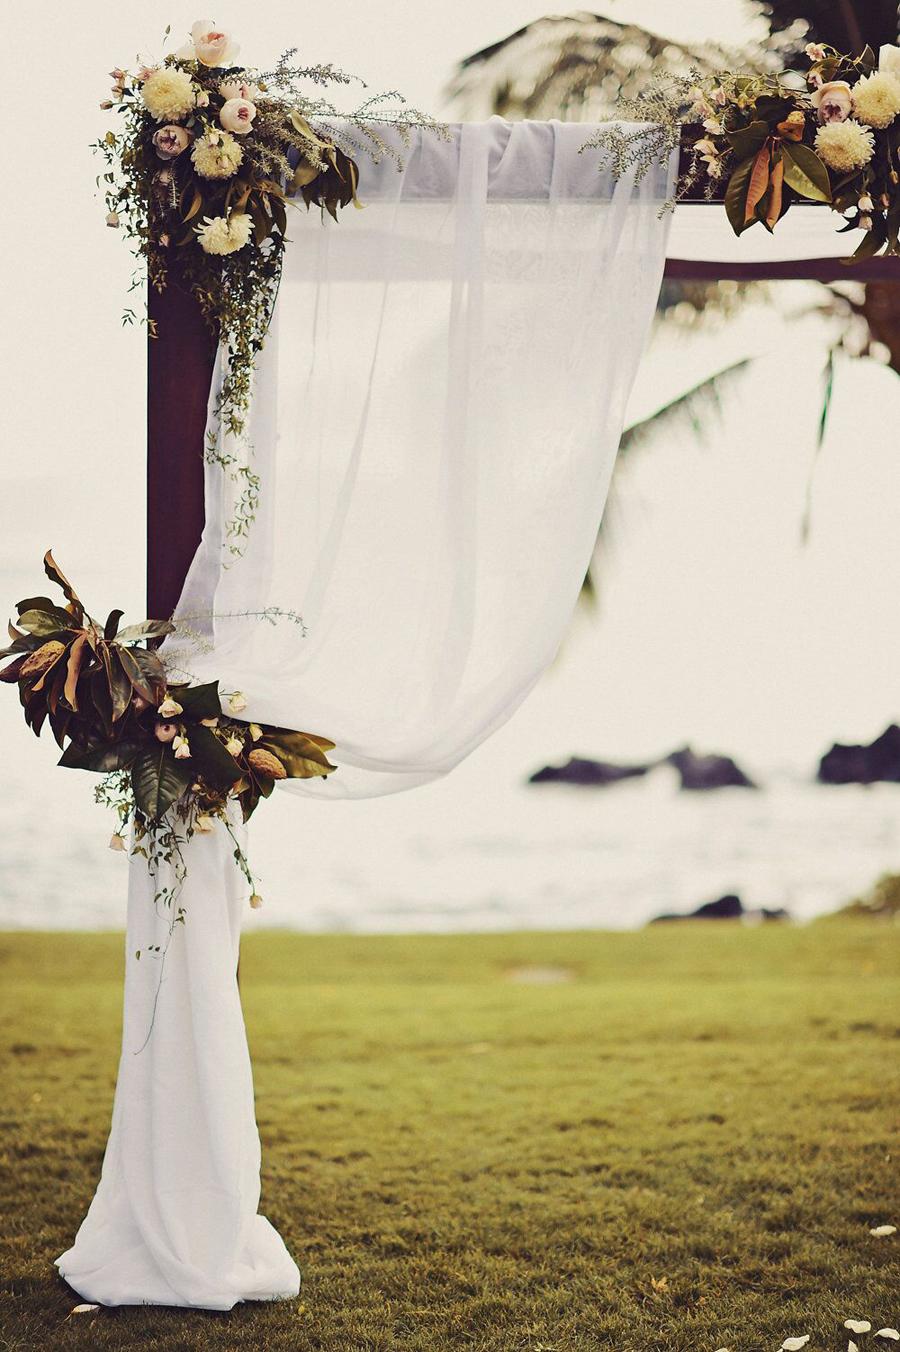 Floral, Floral Design, Blooms, Wedding, Wedding Day, Floral Arch